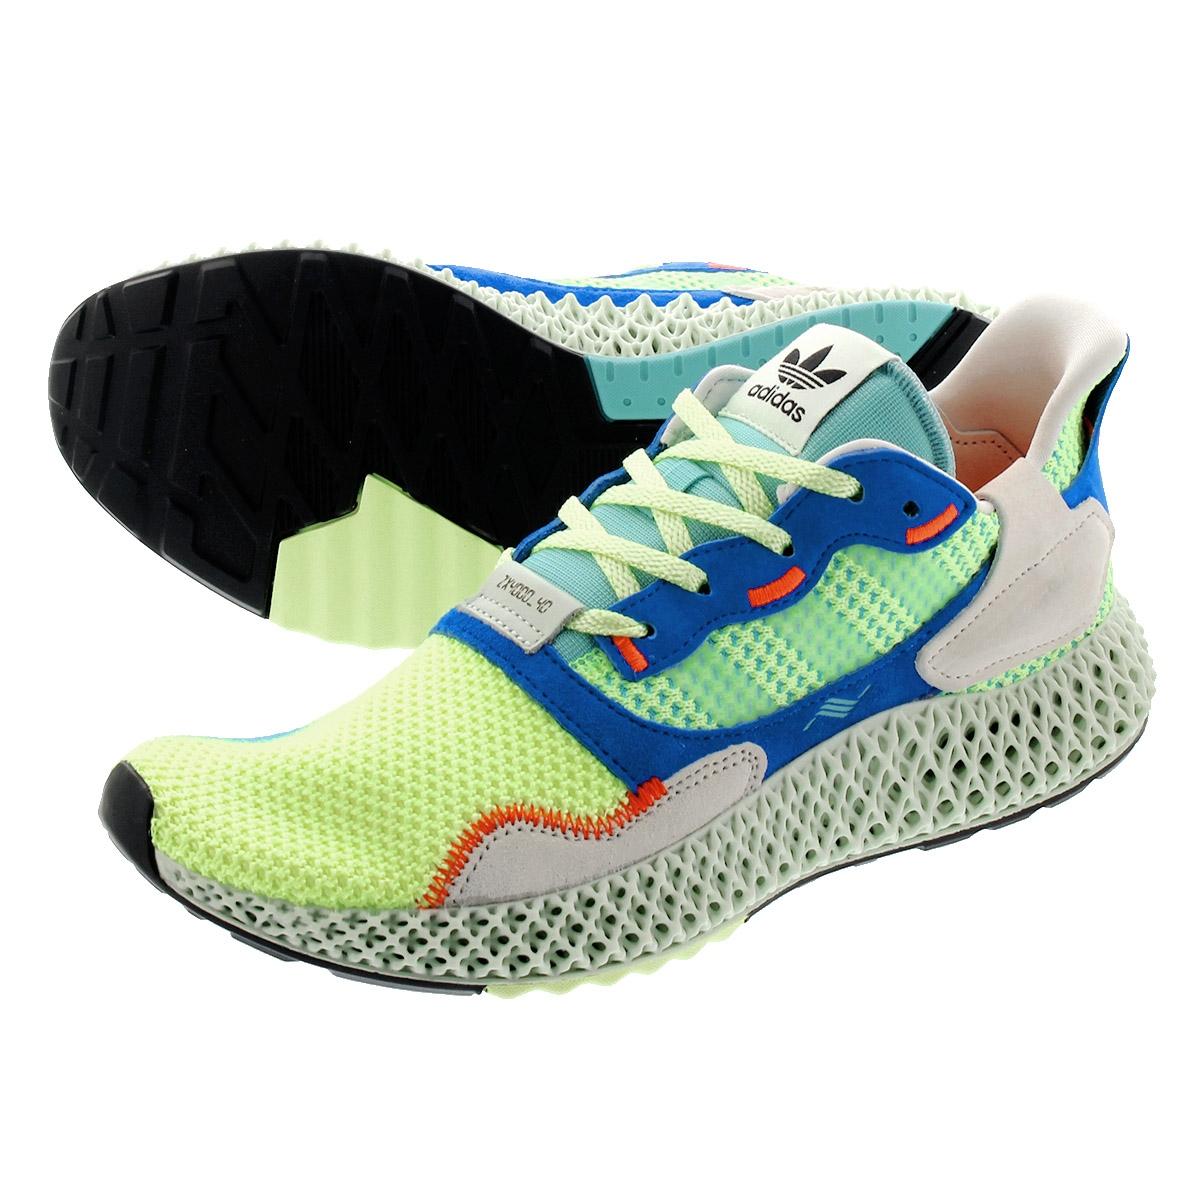 Adidas HI adidas 4D 4000 4000 YELLOWLINEN GREENEASY 4D RES ZX MINT ZX ef9623 PXZwiuTklO